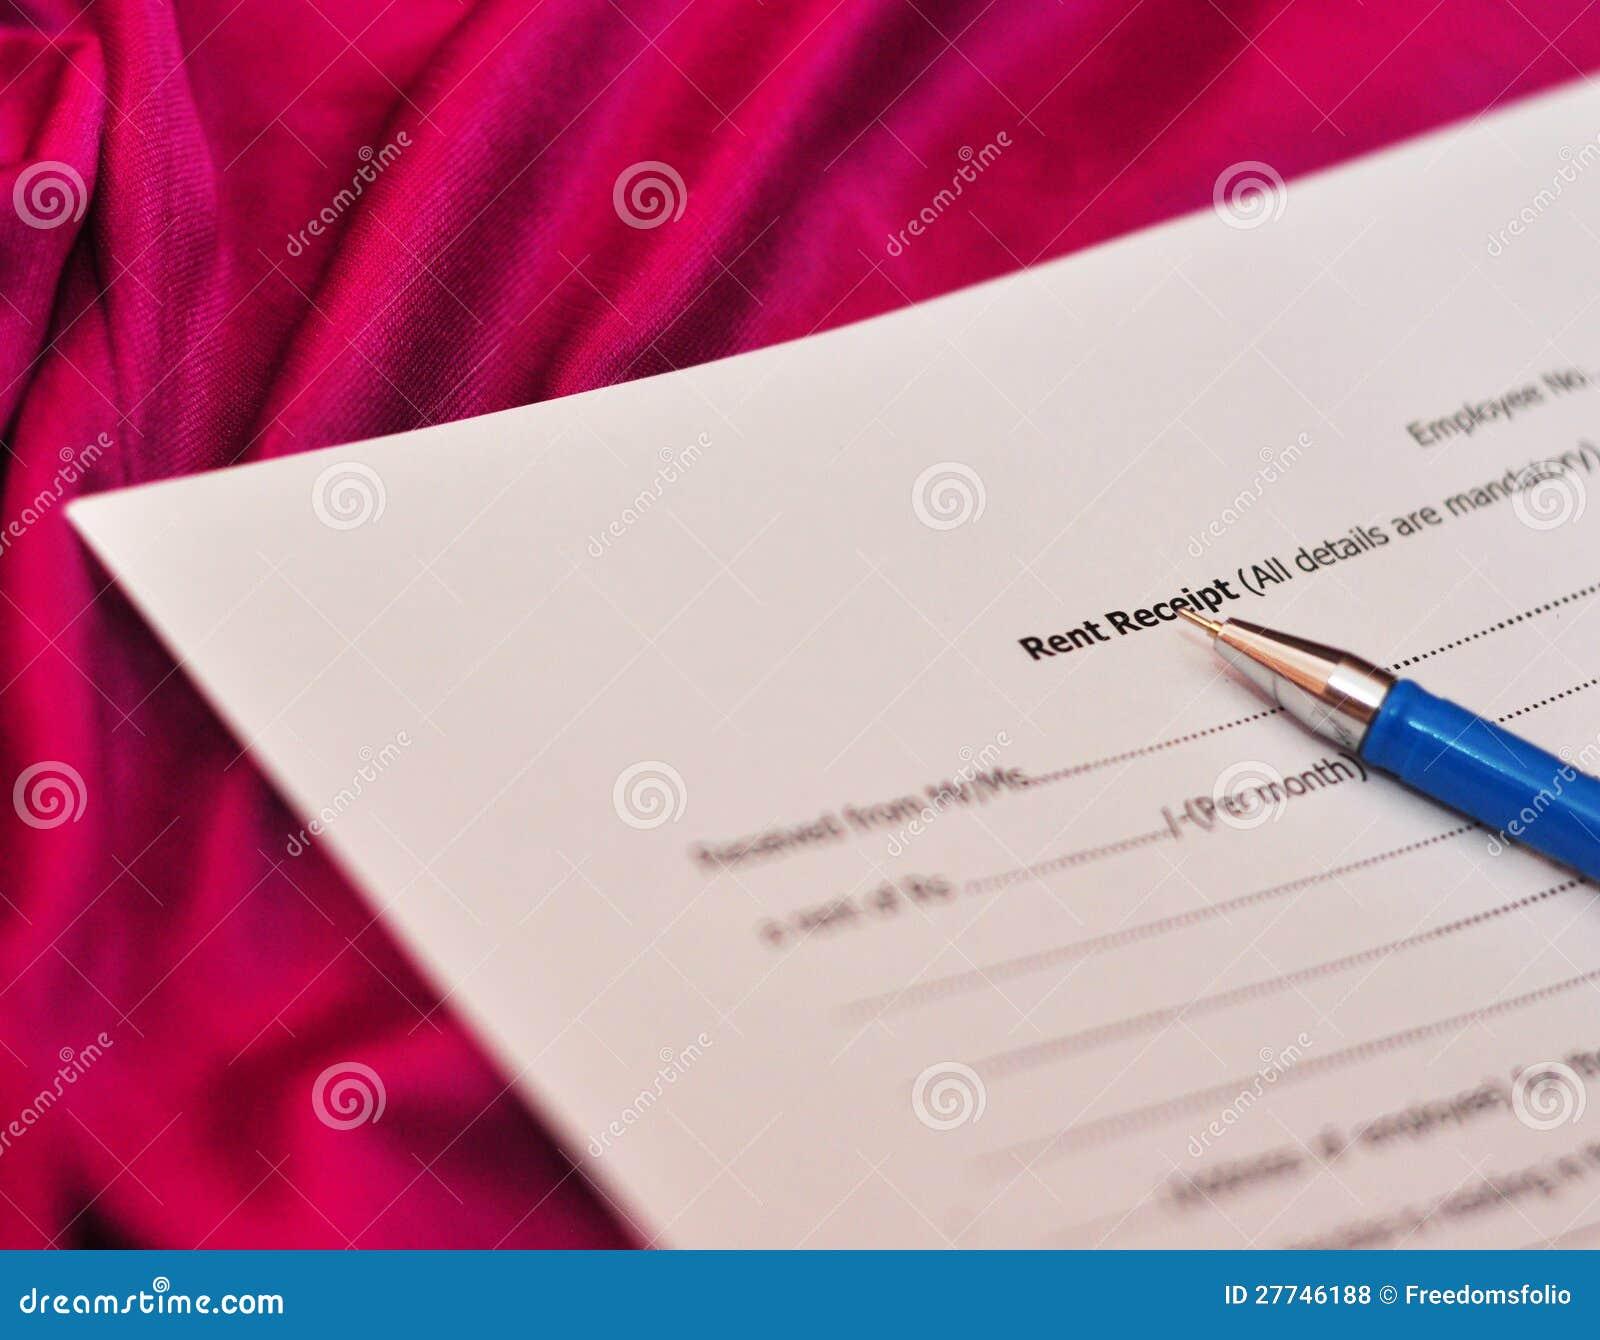 rent receipt form royalty stock photos image 27746188 rent receipt form